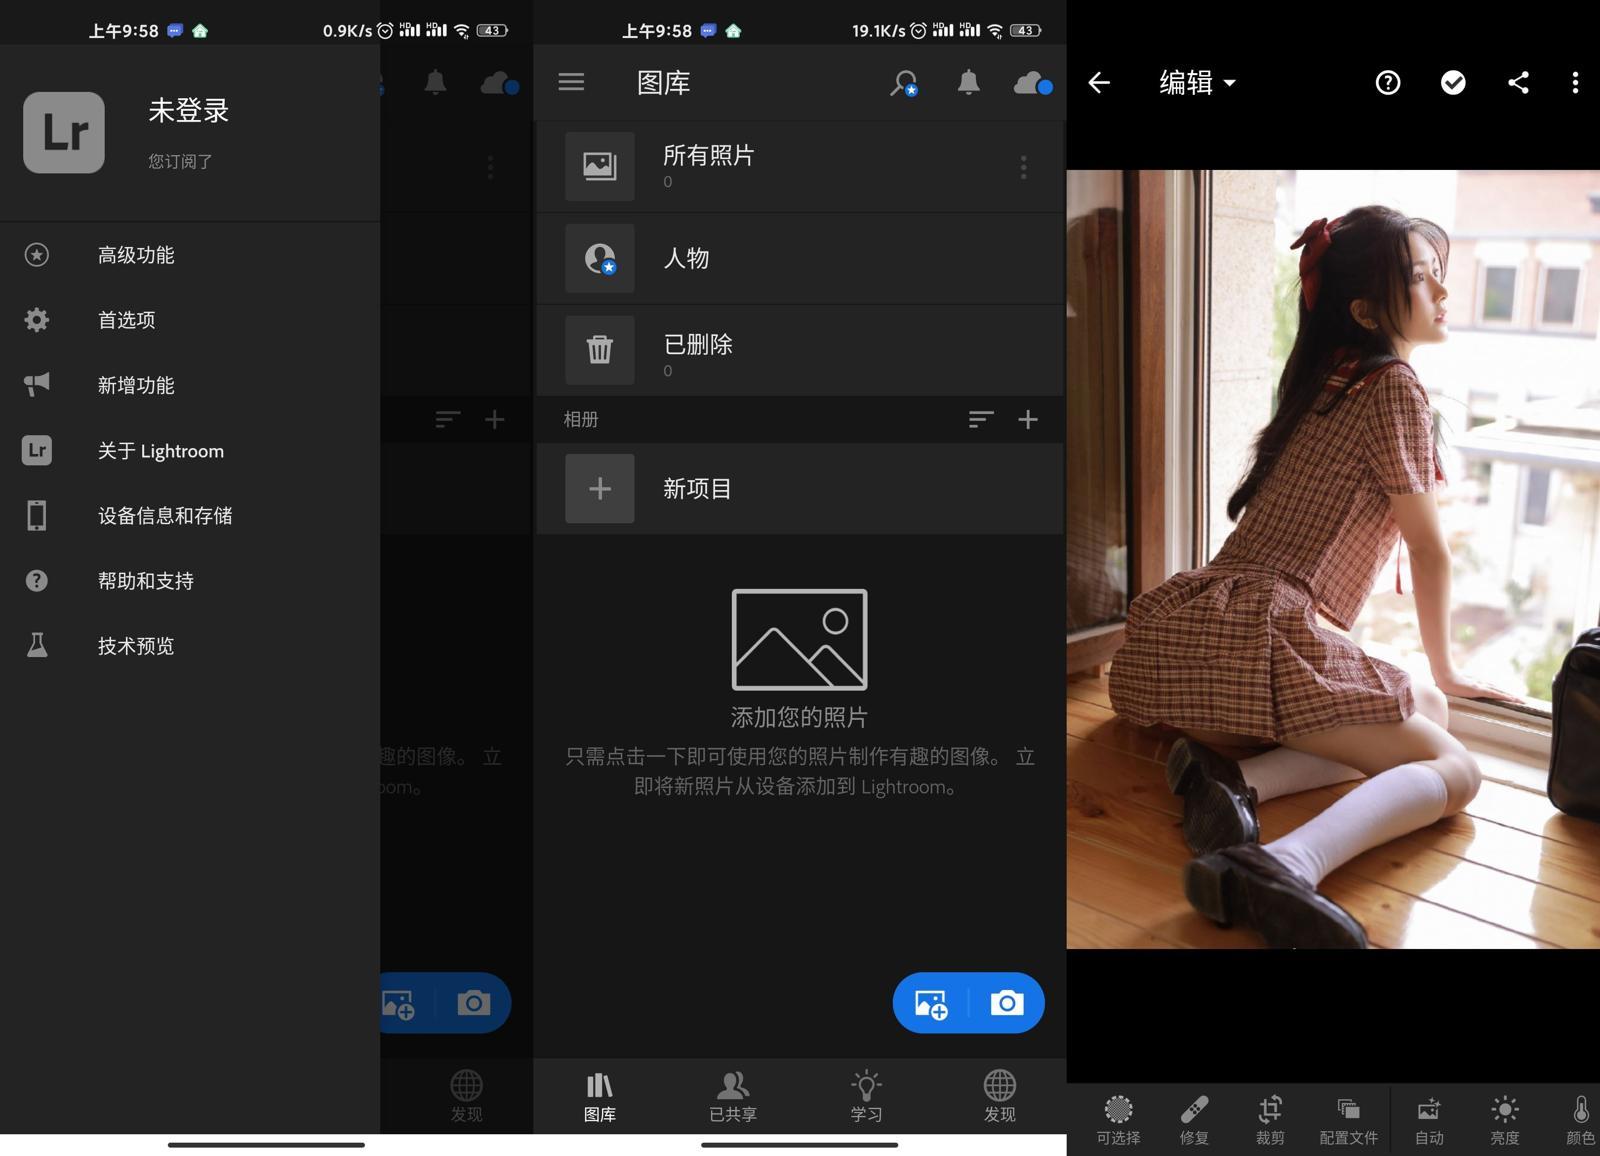 安卓Lightroom v5.4.1高级版